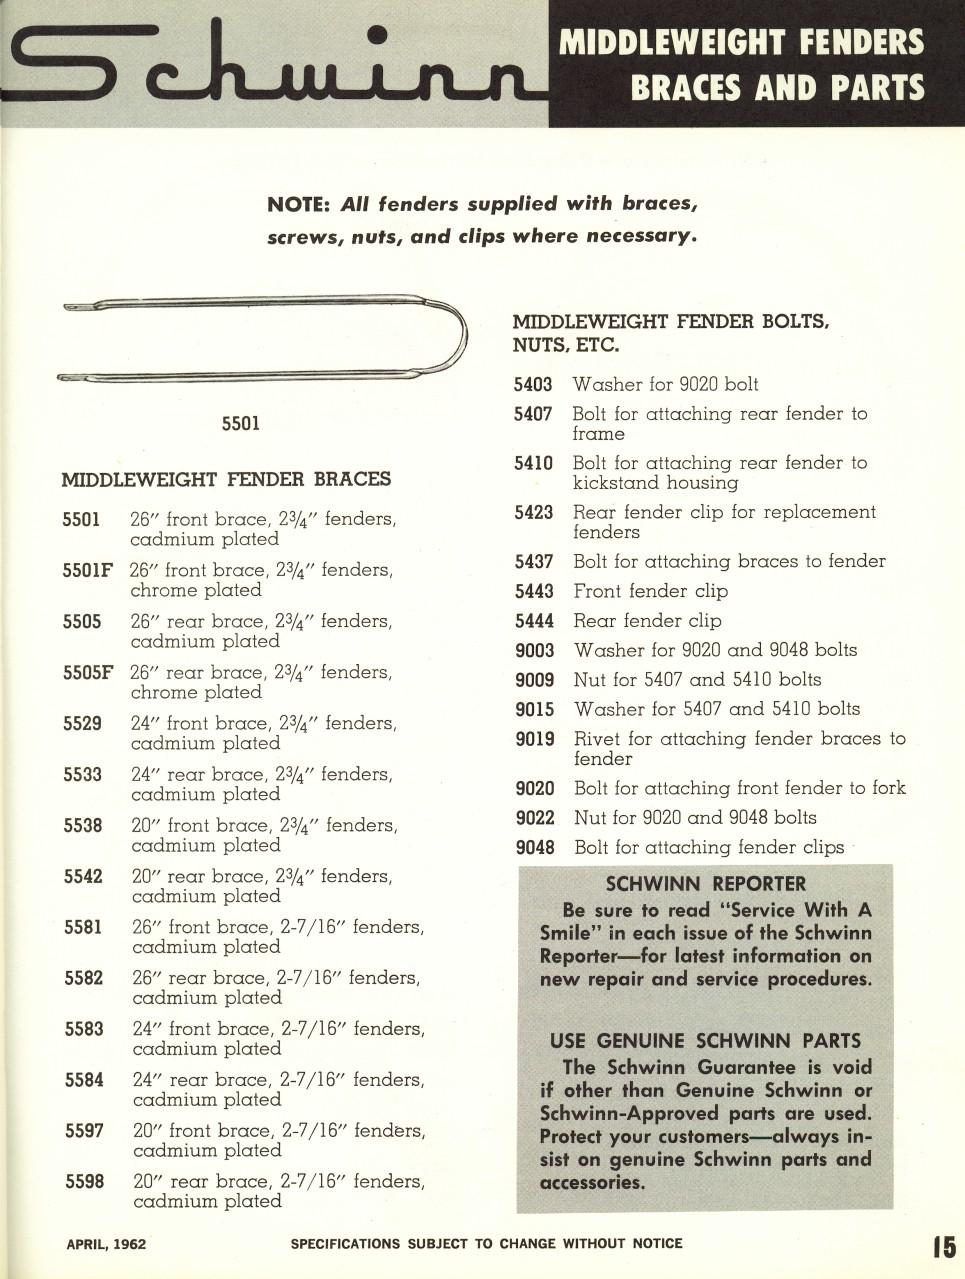 SLDB 1962 Parts & Accessories Catalog - pg 15